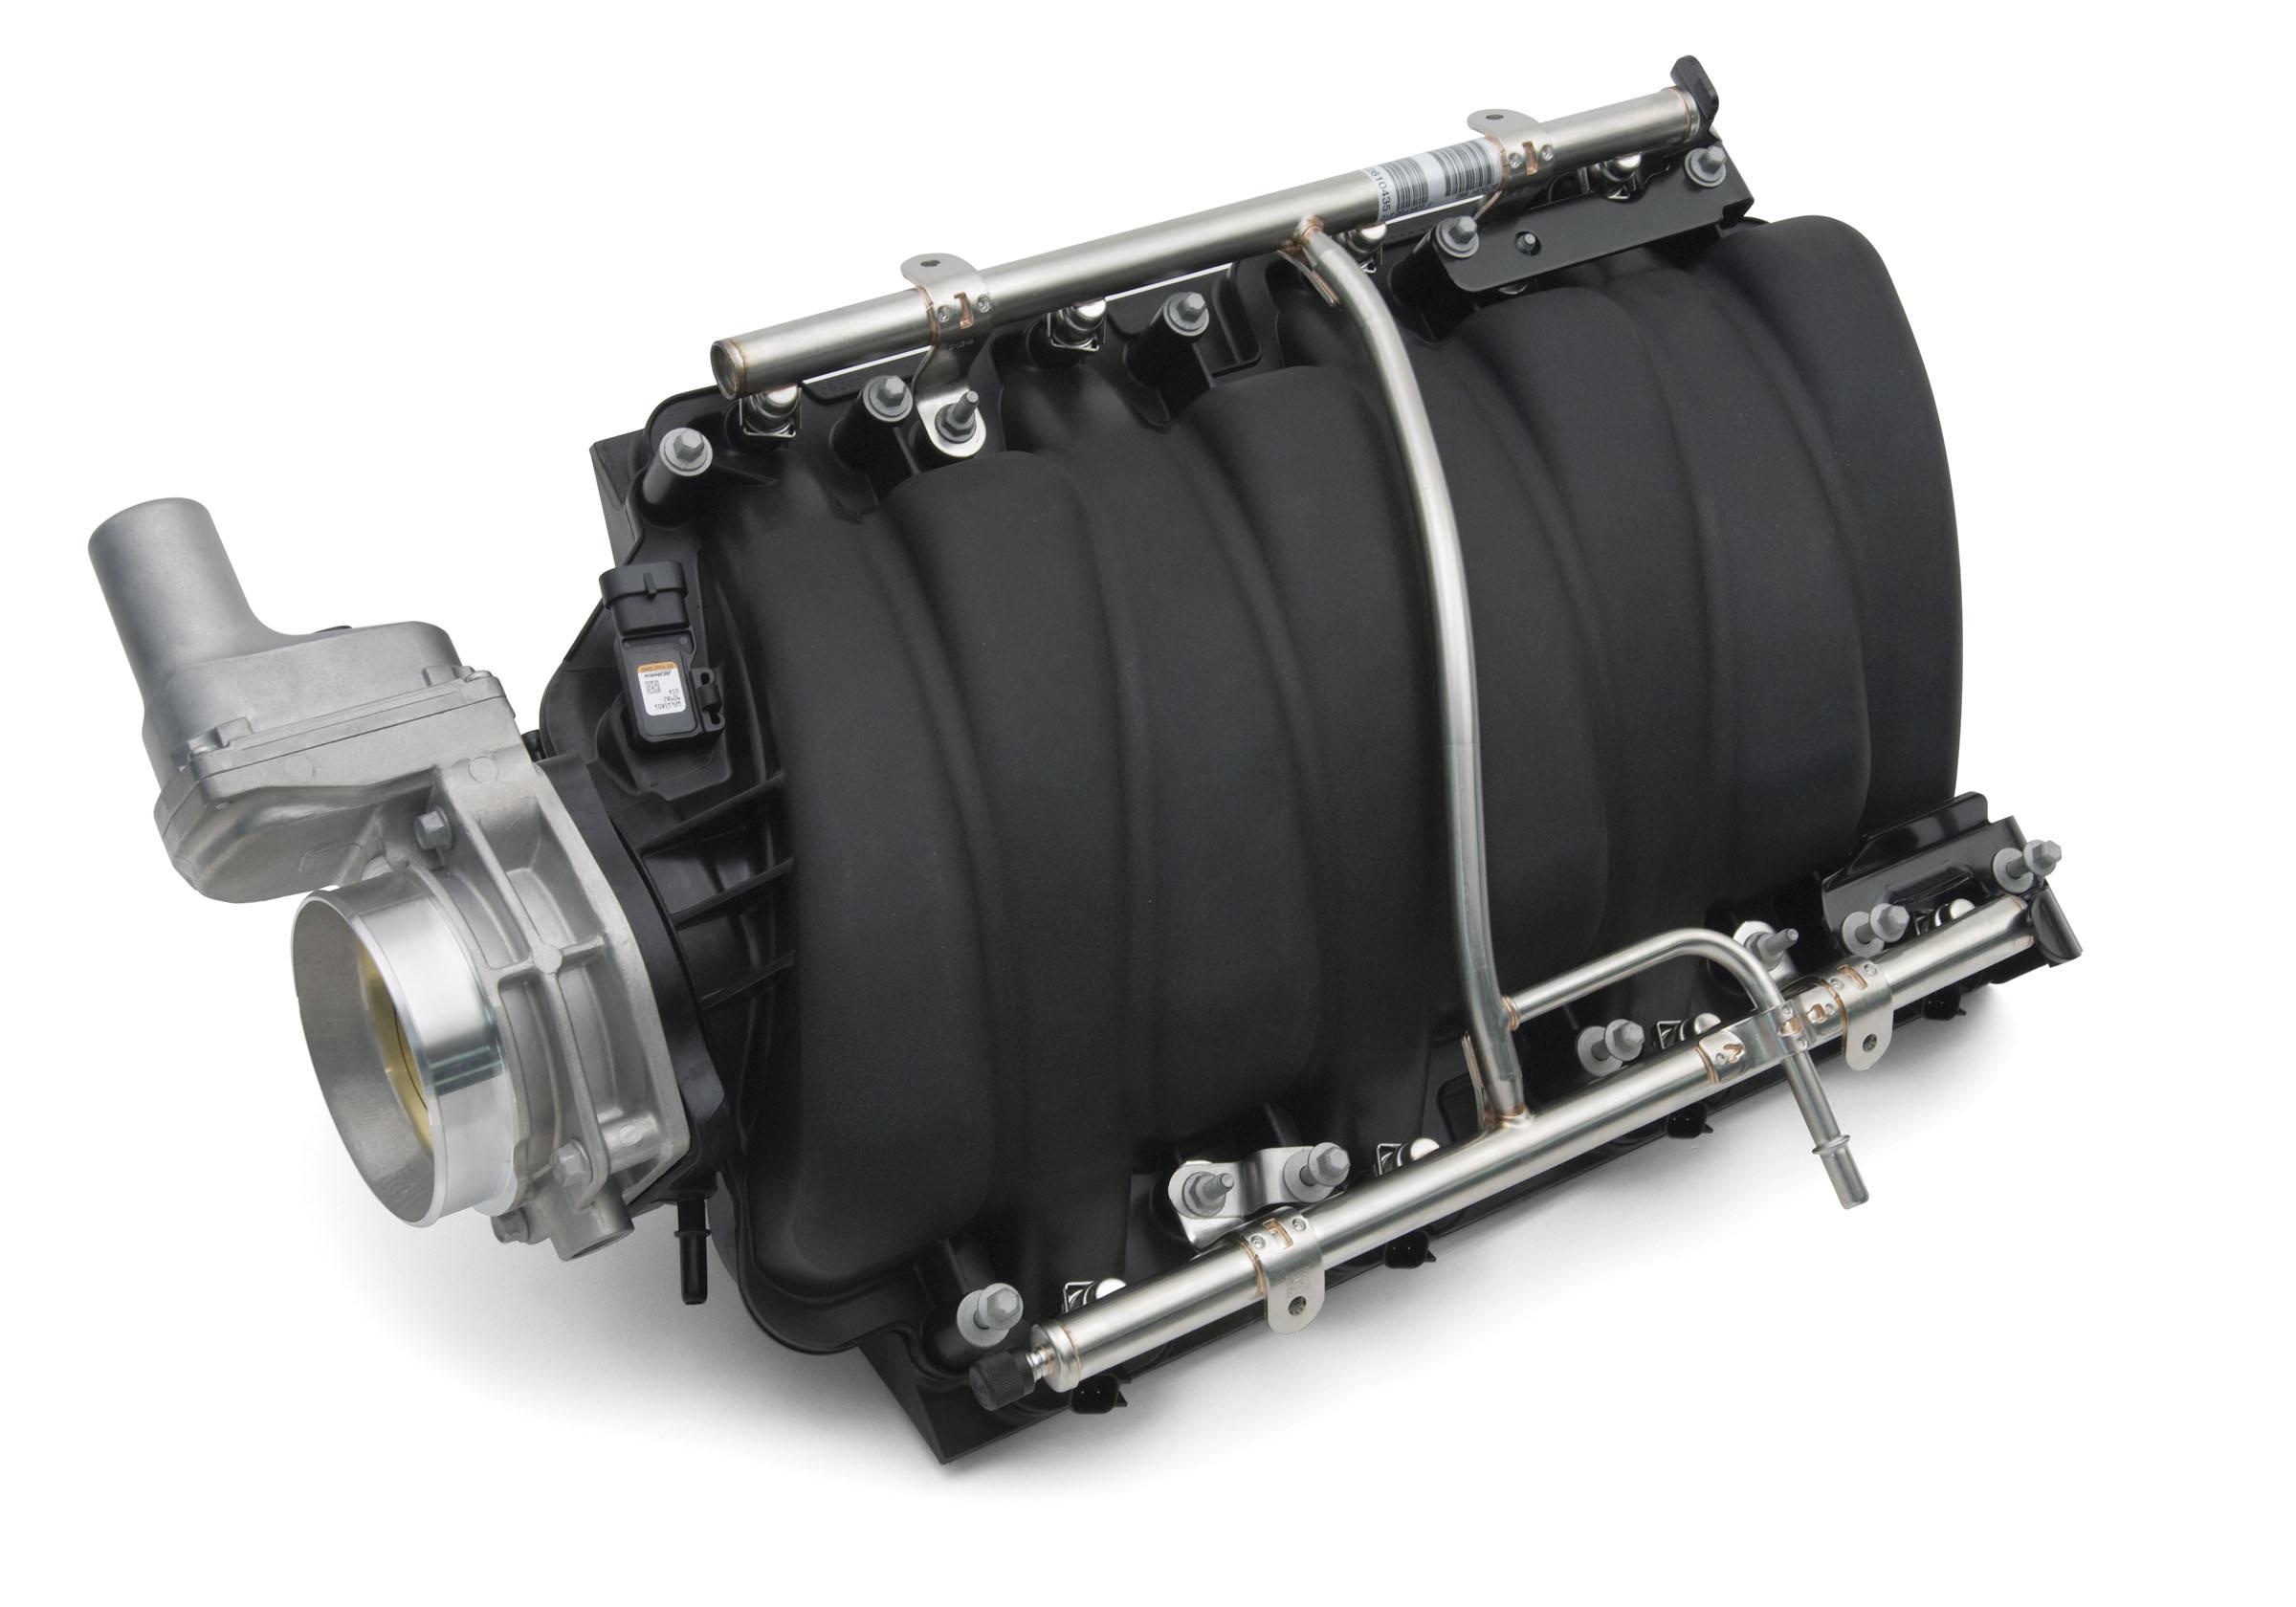 gmpp announces lsx454 crate engine intake kit